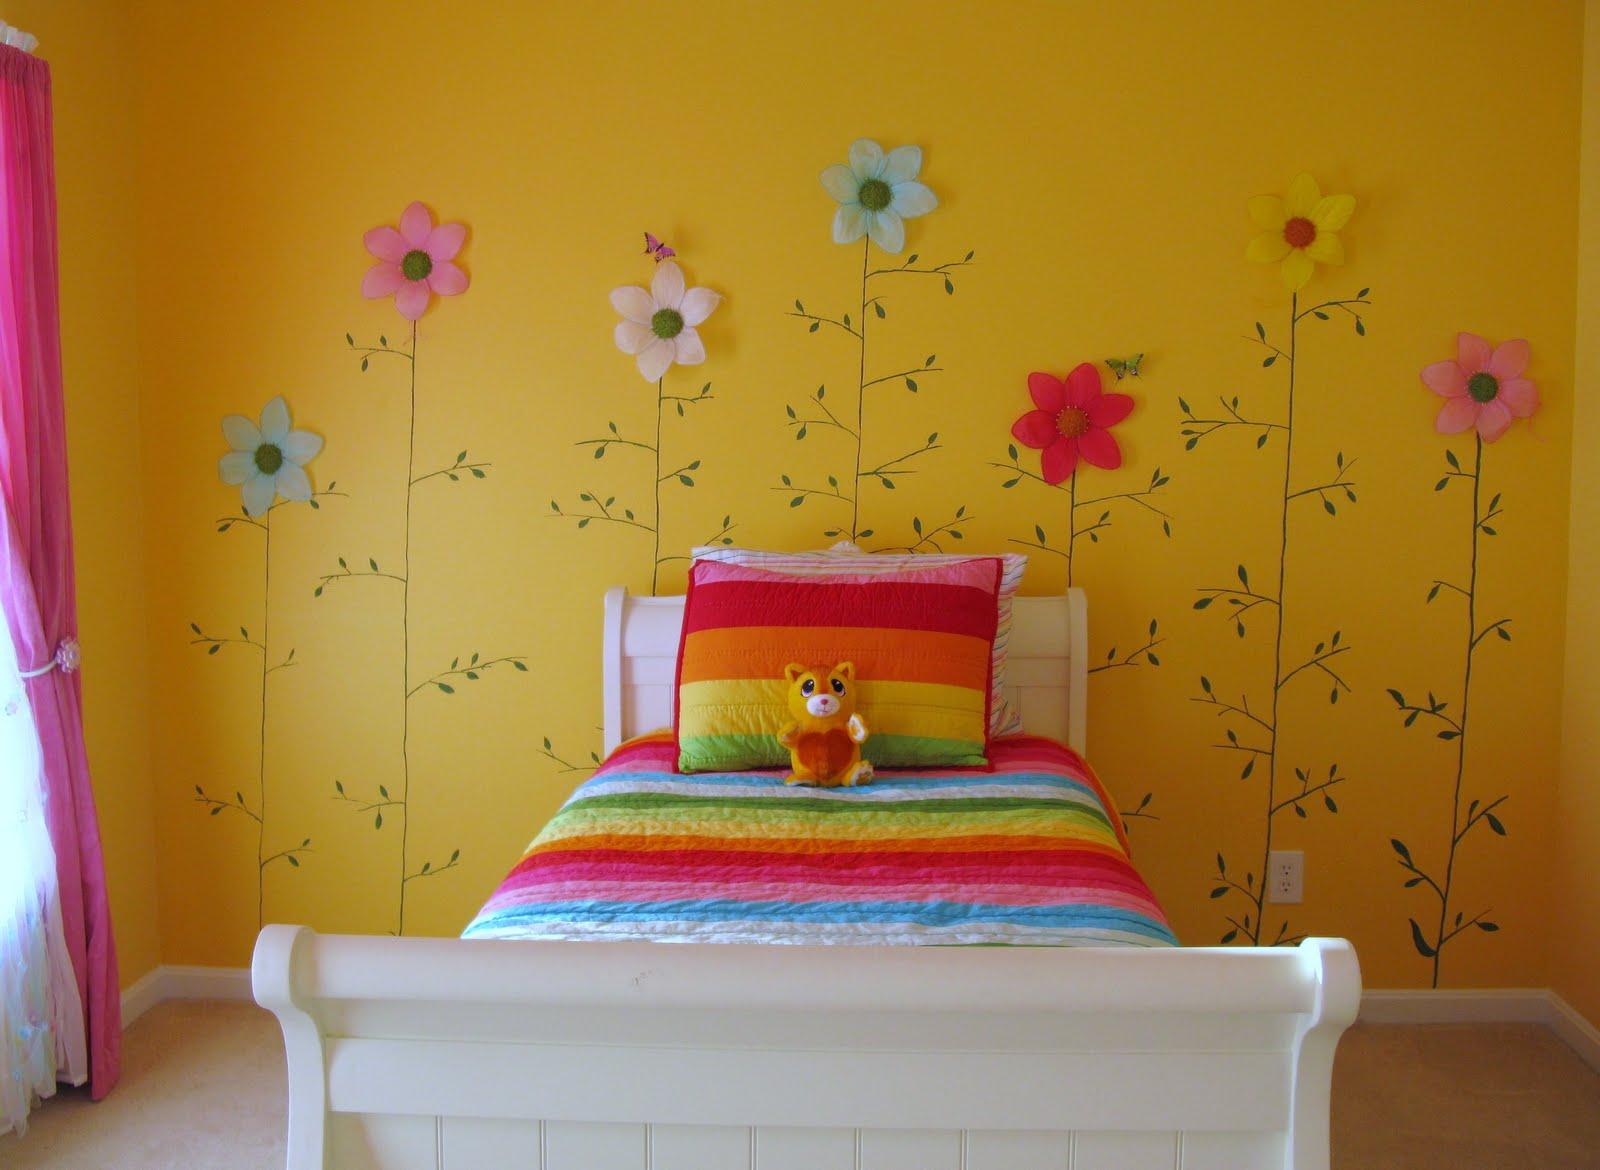 cute-decorating-ideas-for-little-girls-door-Little-Girls-Yellow-Flower-Bedroom-wallpaper-wpc5803827